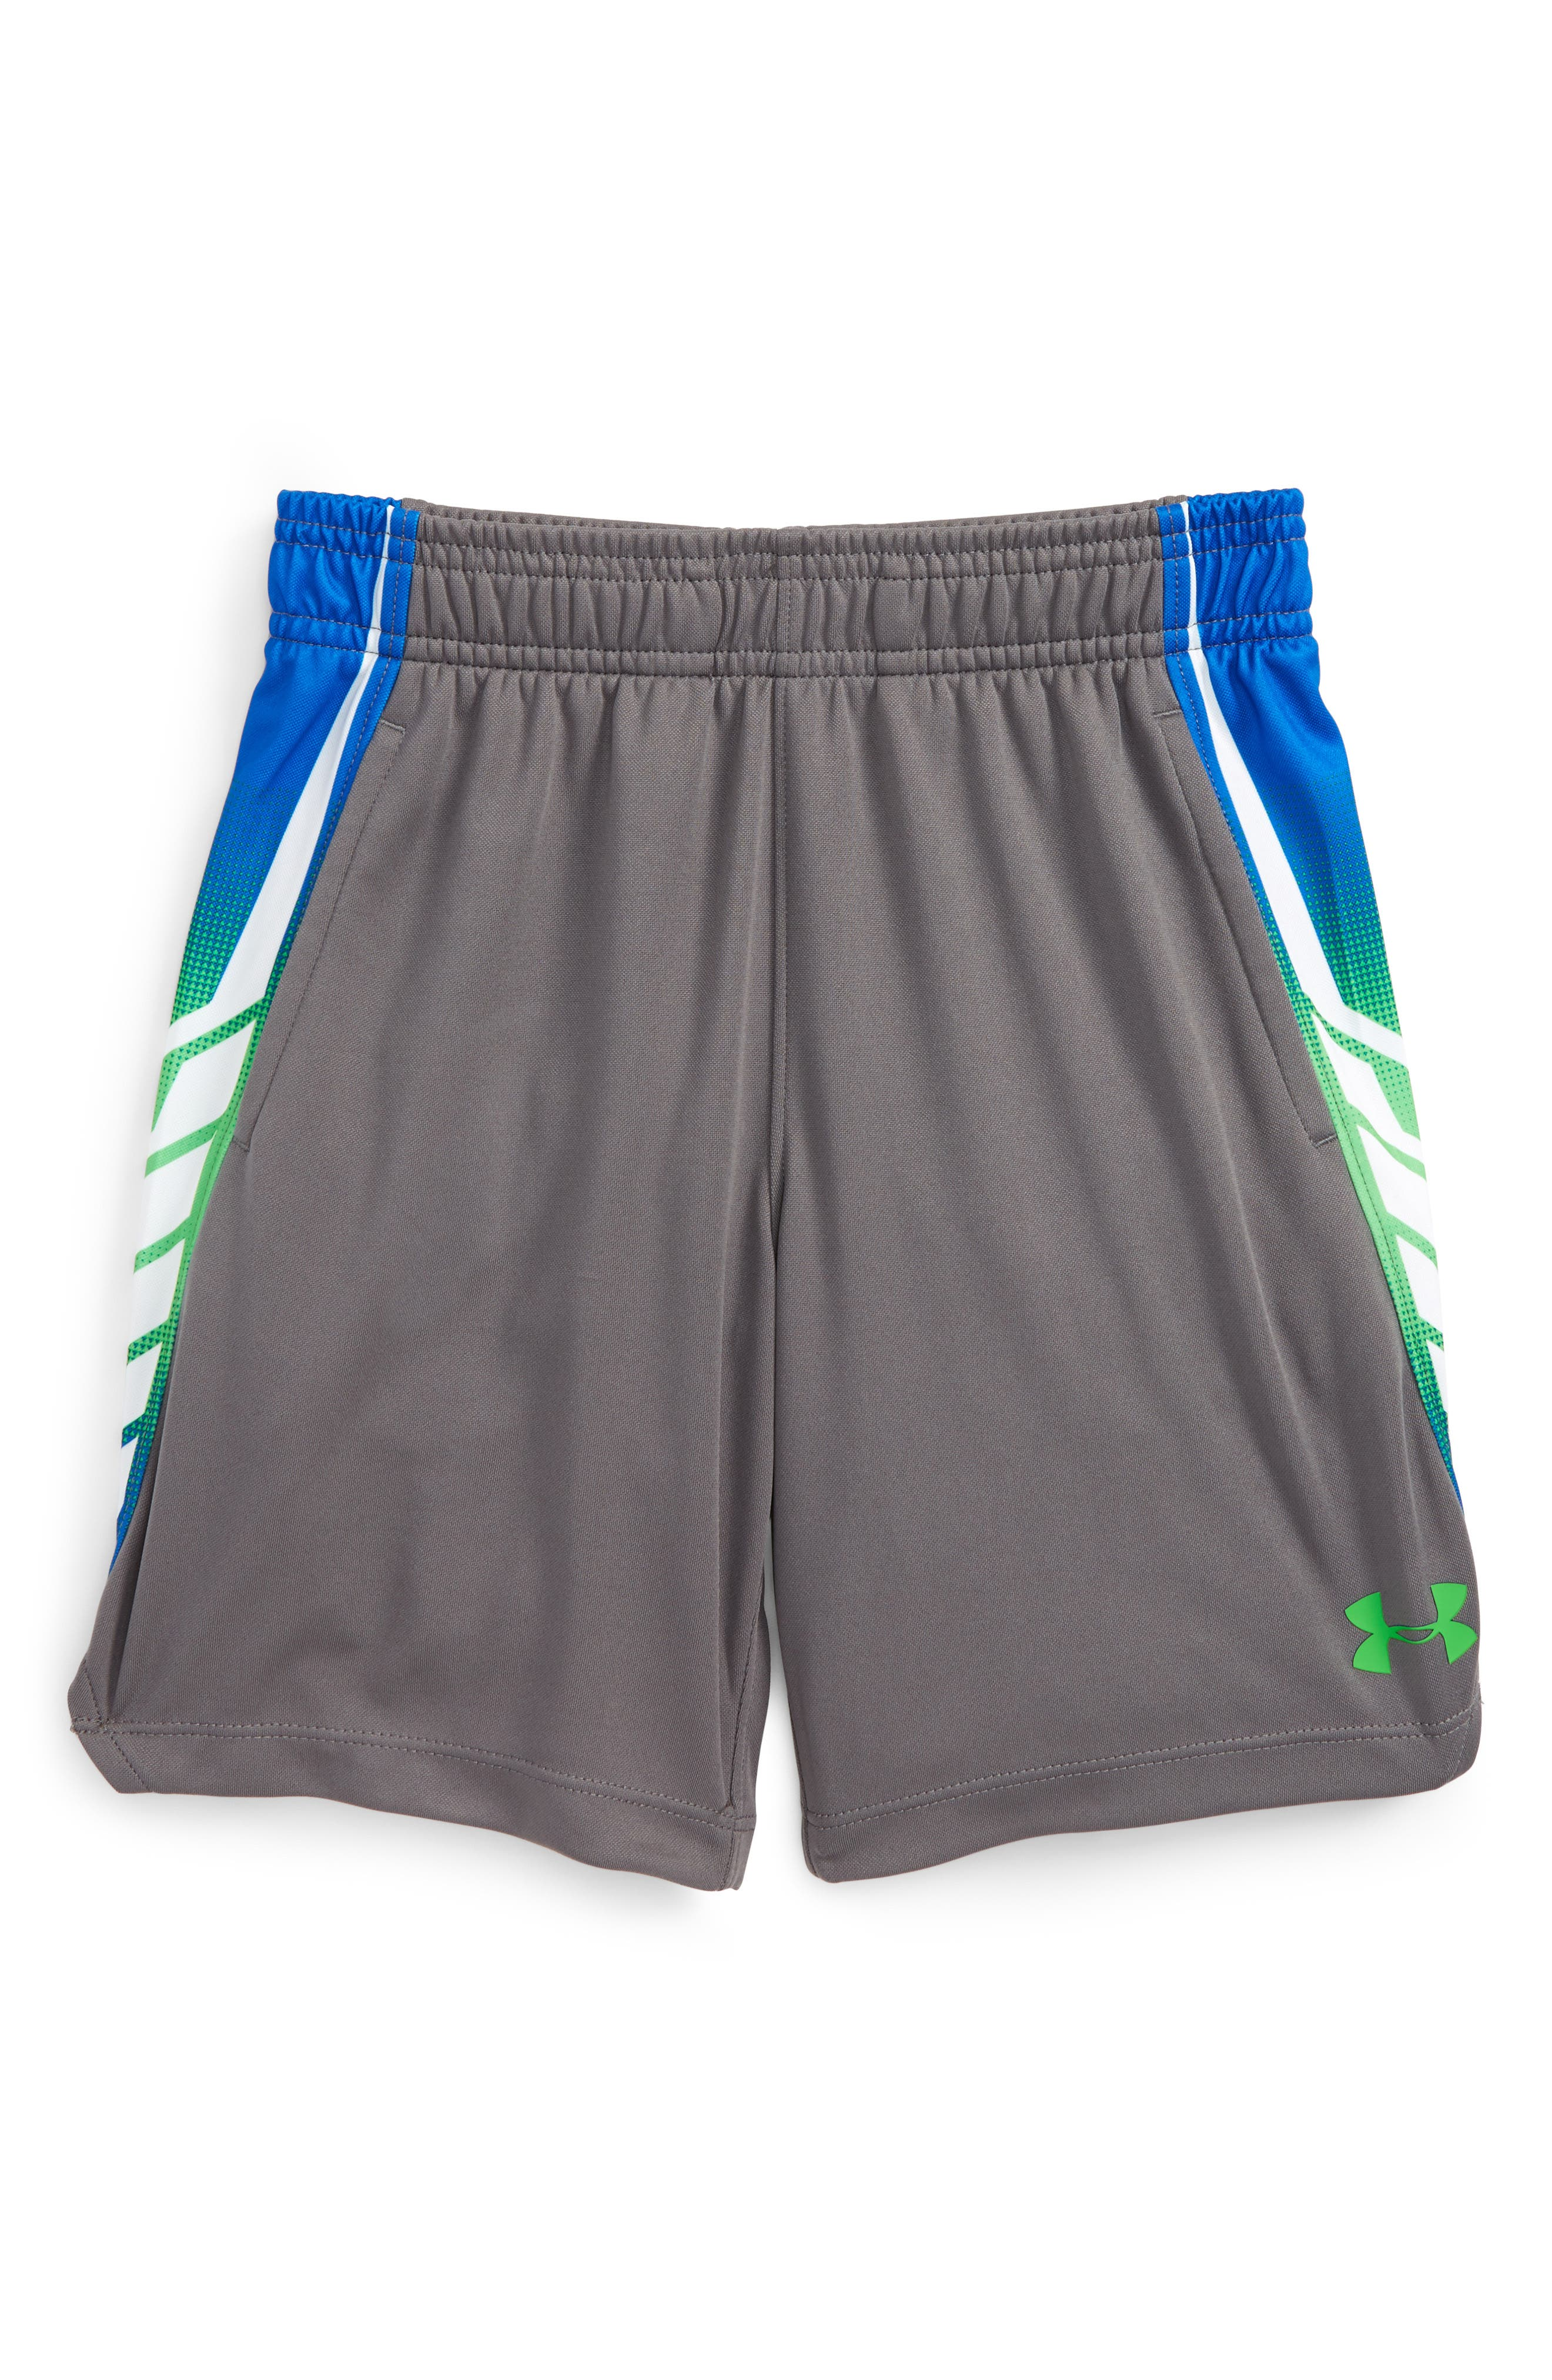 Under Armour Gradient Select Shorts (Toddler Boys & Little Boys)